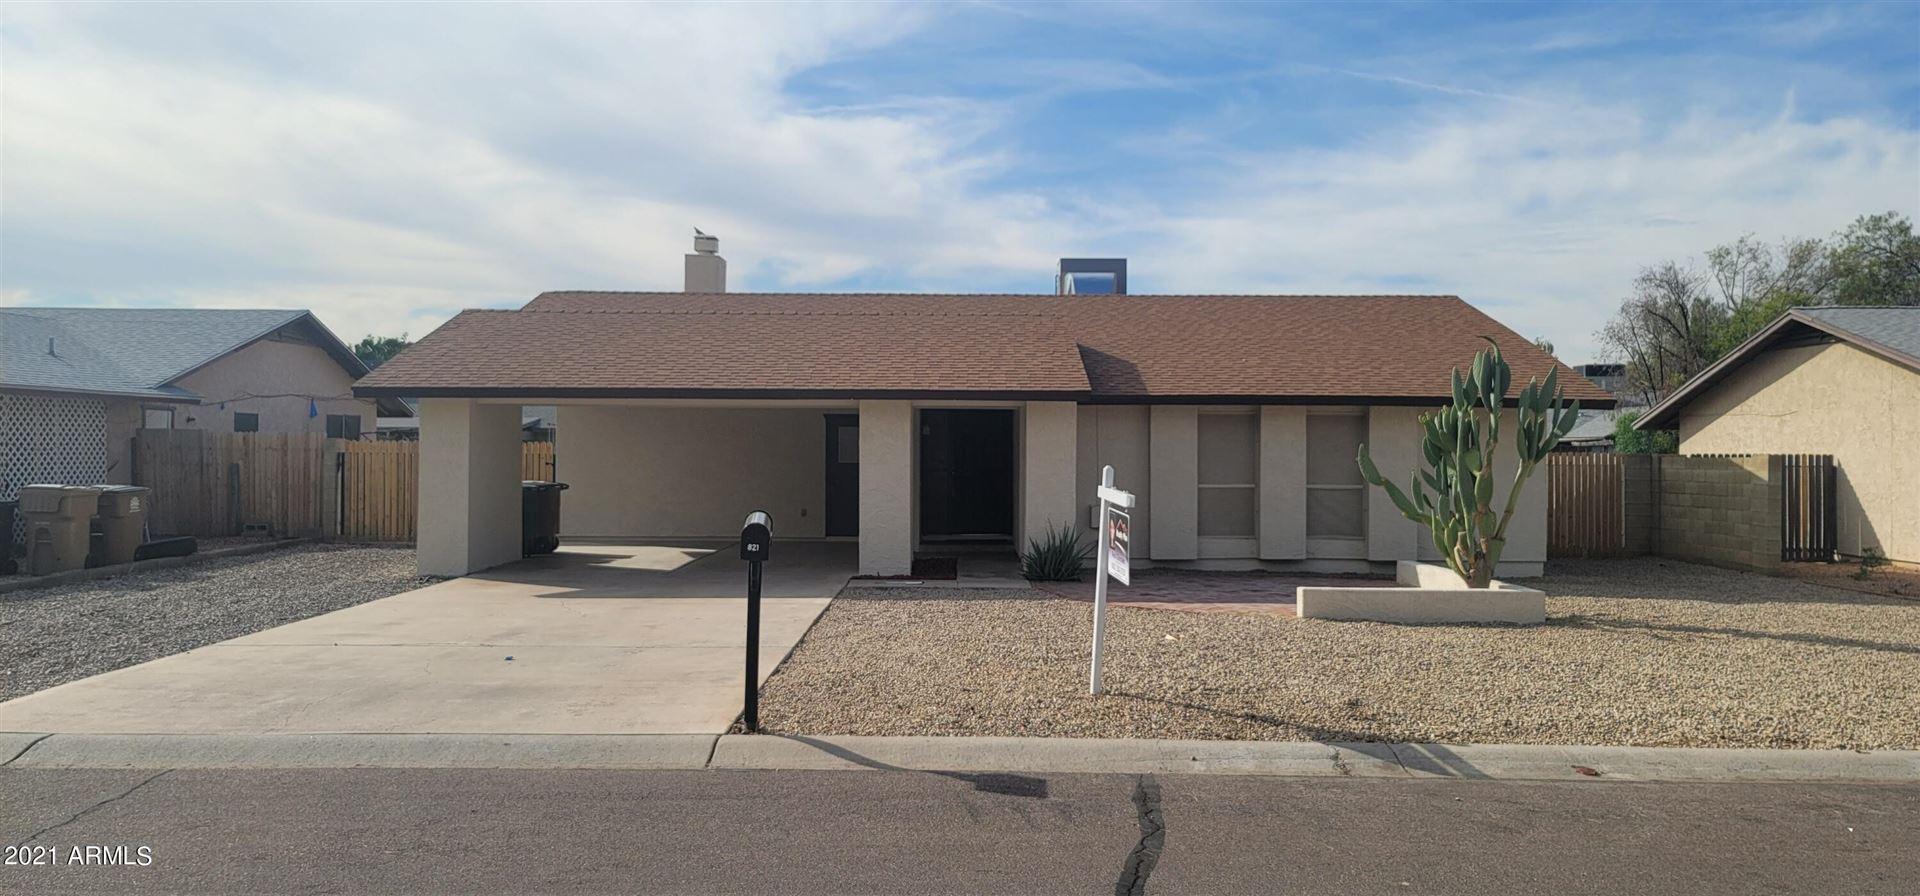 Photo of 821 E CALLE ADOBE Lane, Goodyear, AZ 85338 (MLS # 6269108)